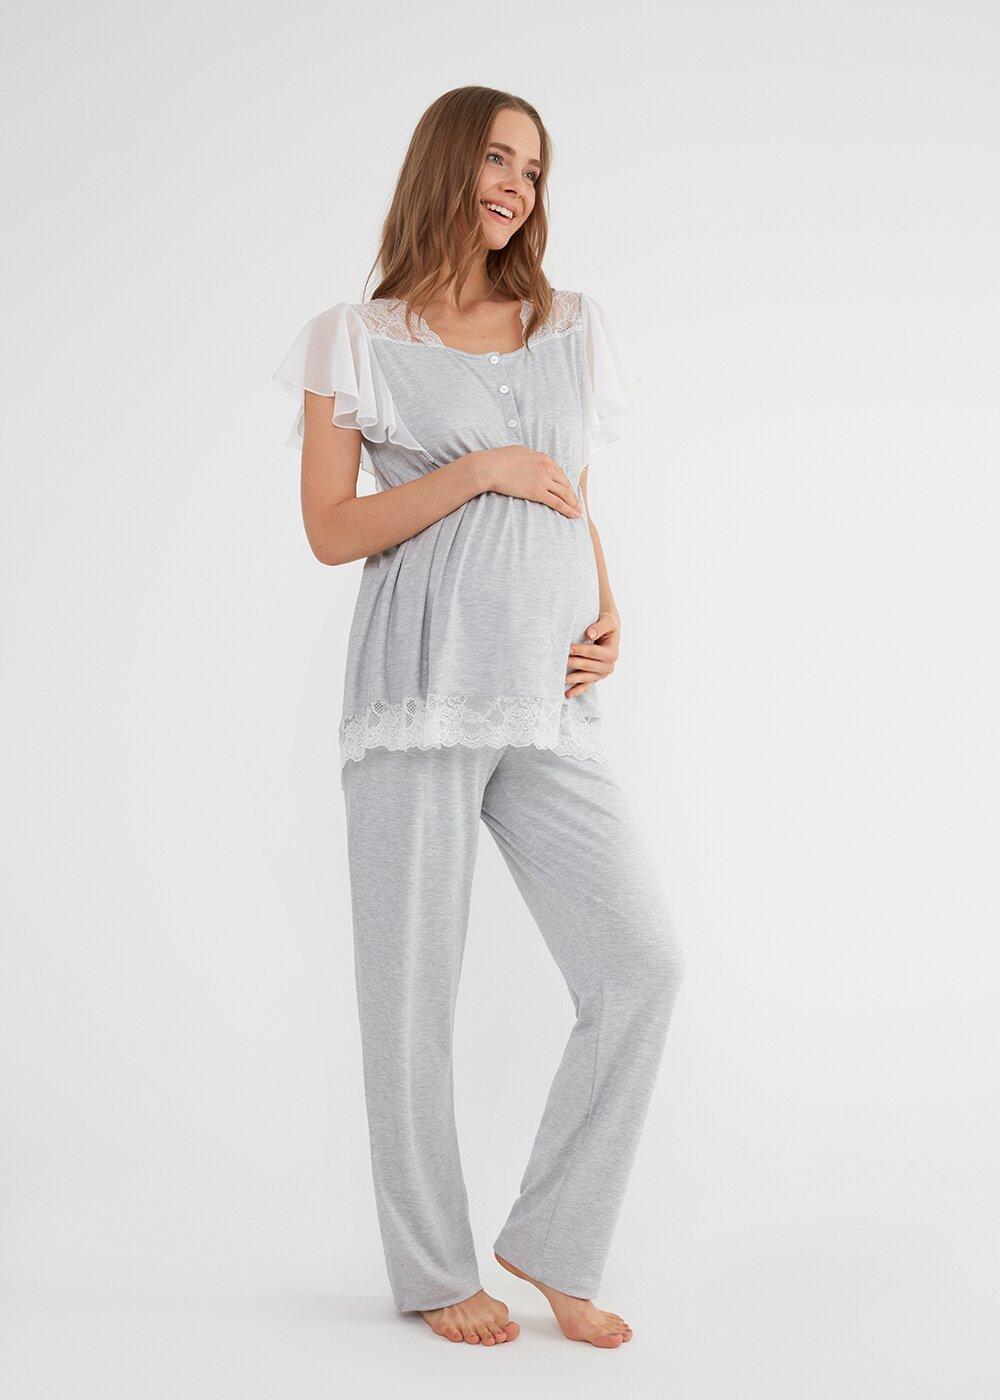 resm Mia Hamile Lohusa Pijama Takımı - GRİLİ